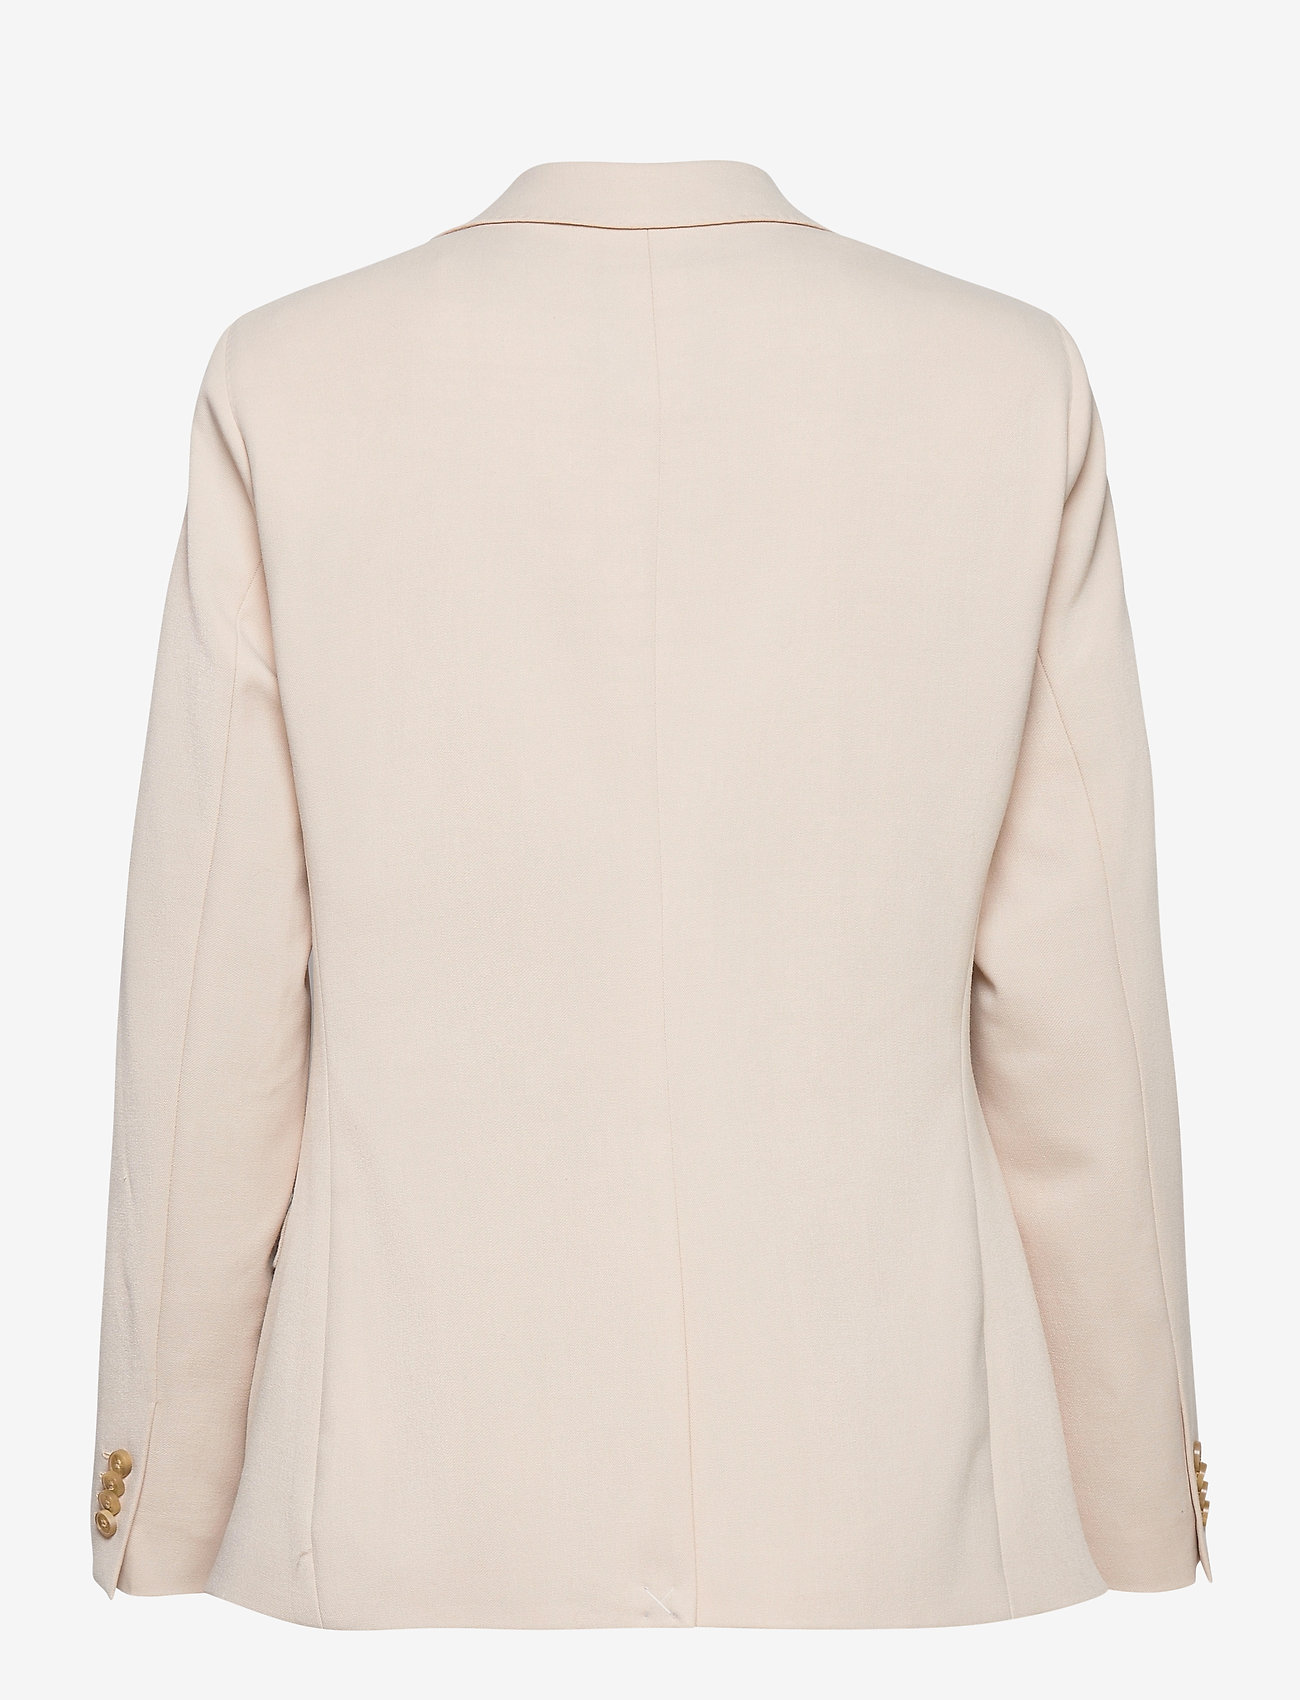 SAND - 3596 - Rani DB - vestes habillées - off white - 1